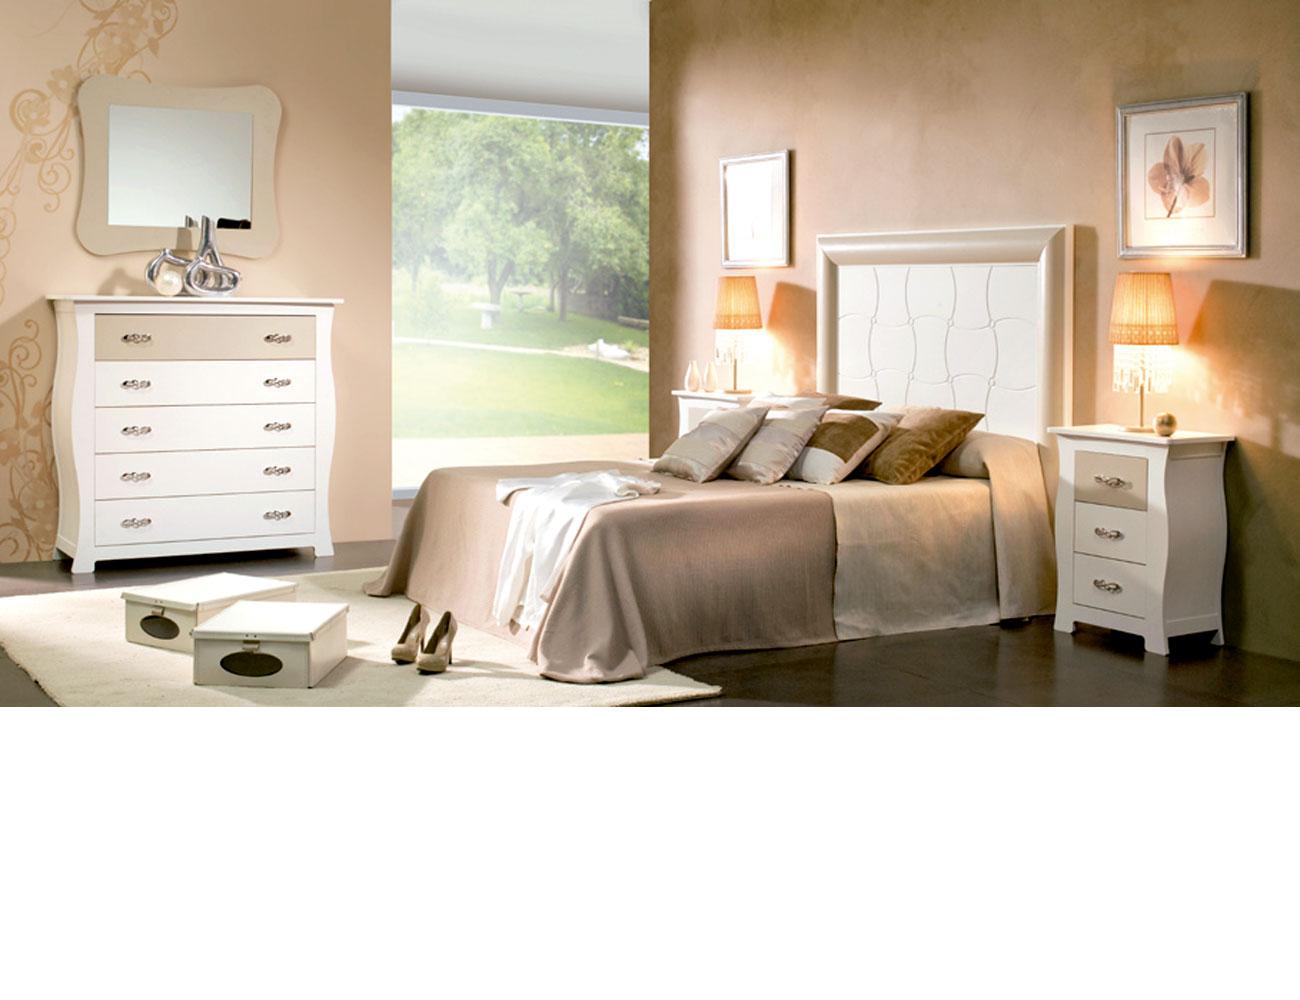 Dormitorio de matrimonio de alta gama con cabecero - Dormitorios clasicos modernos ...